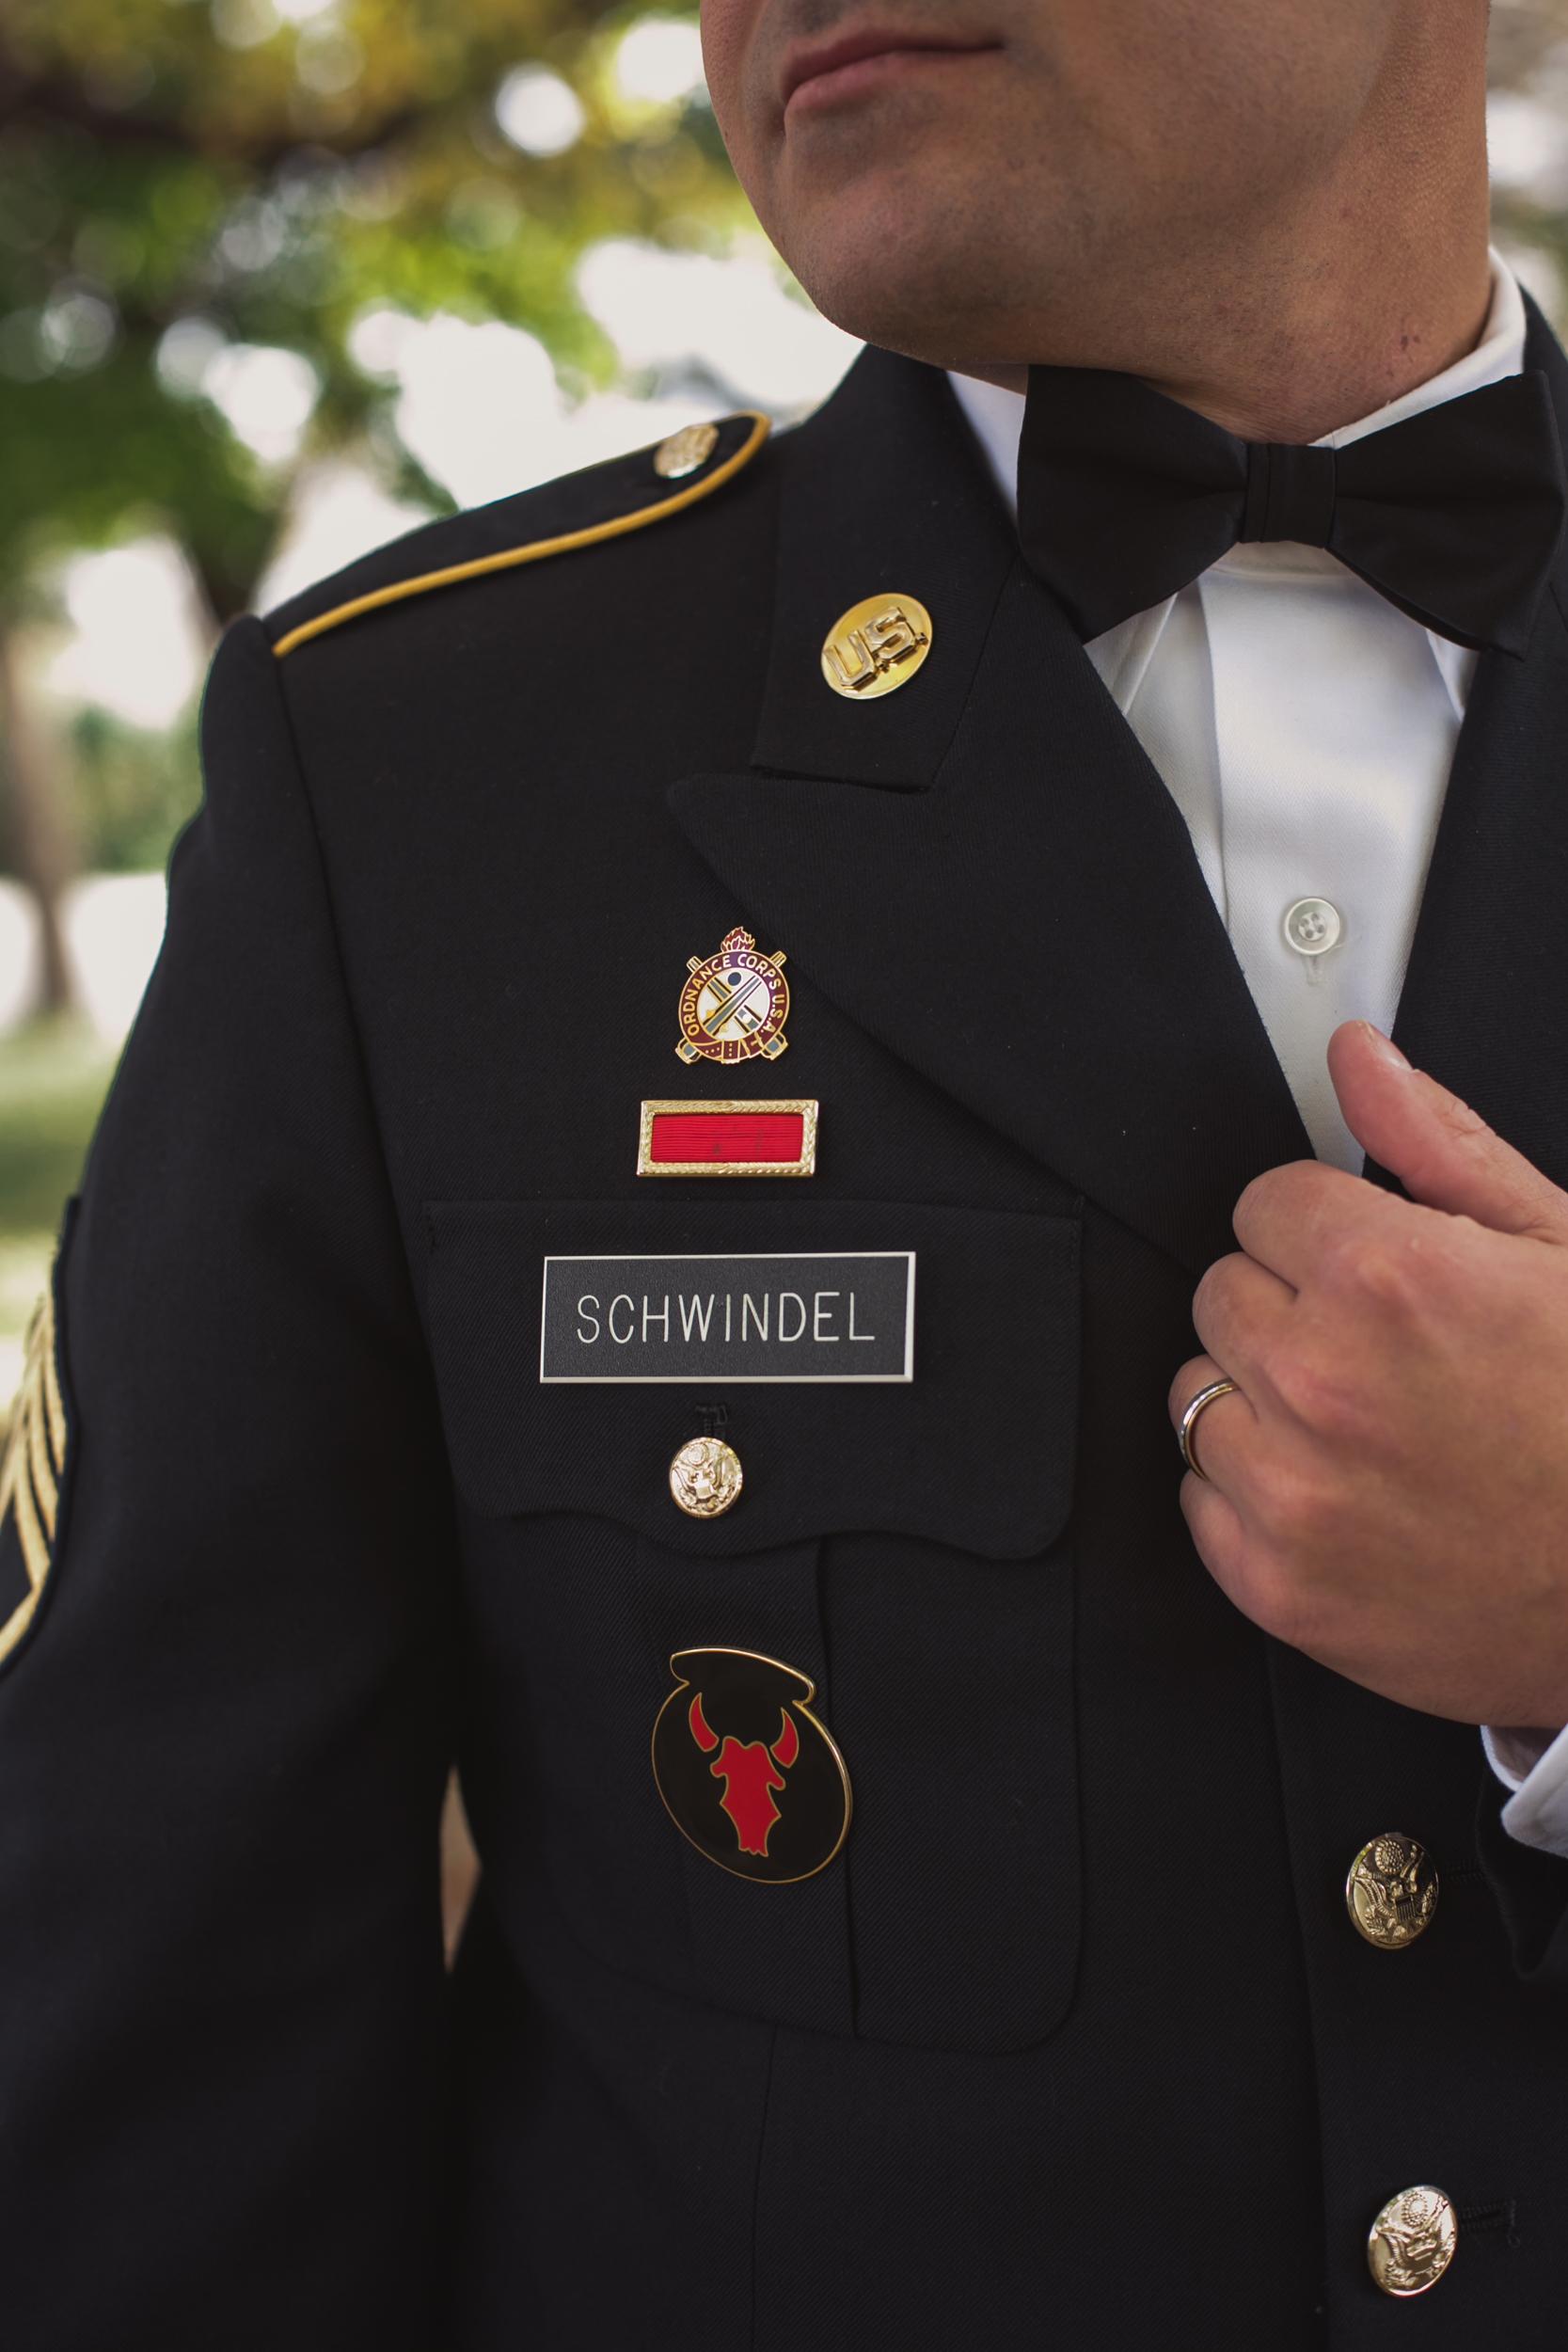 Fort Snelling Elopement St. Paul, MN, Fort Snelling Elopement, Military Elopement, Intimate Military Wedding, intimate elopement wedding-www.rachelsmak.com8.jpg